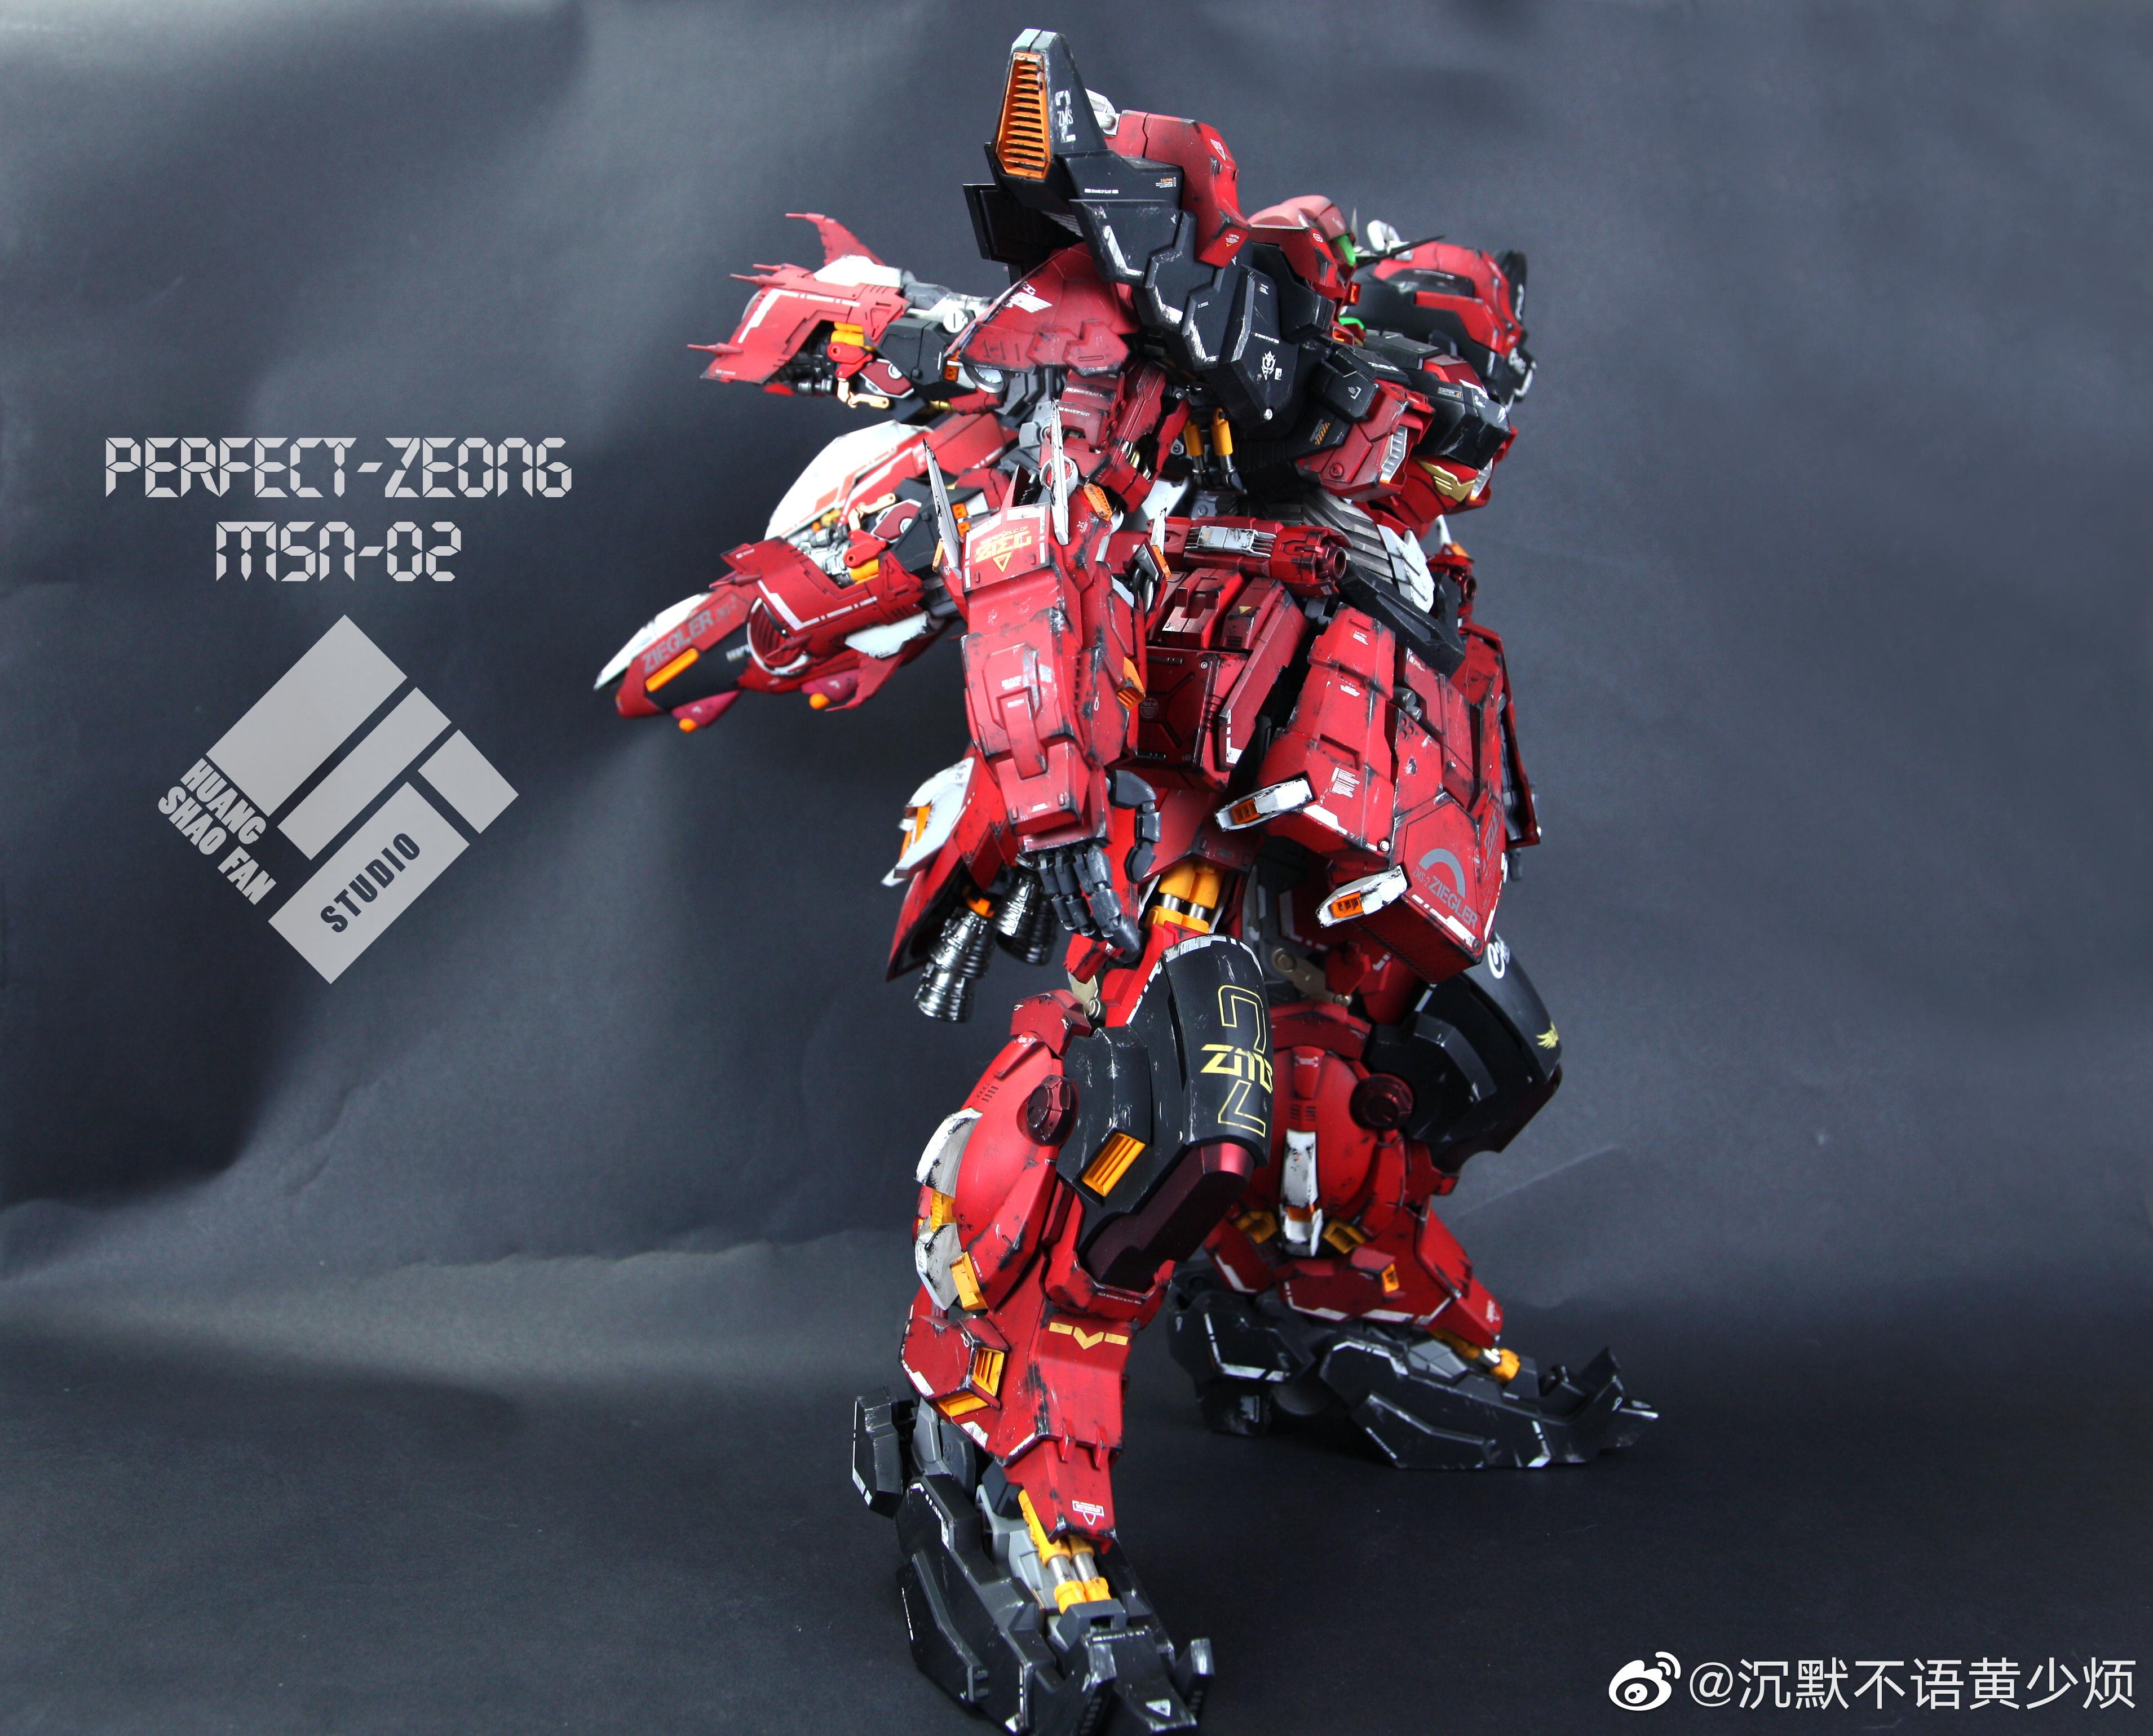 S164_2_mc_perfect_zeong_red_007.jpg